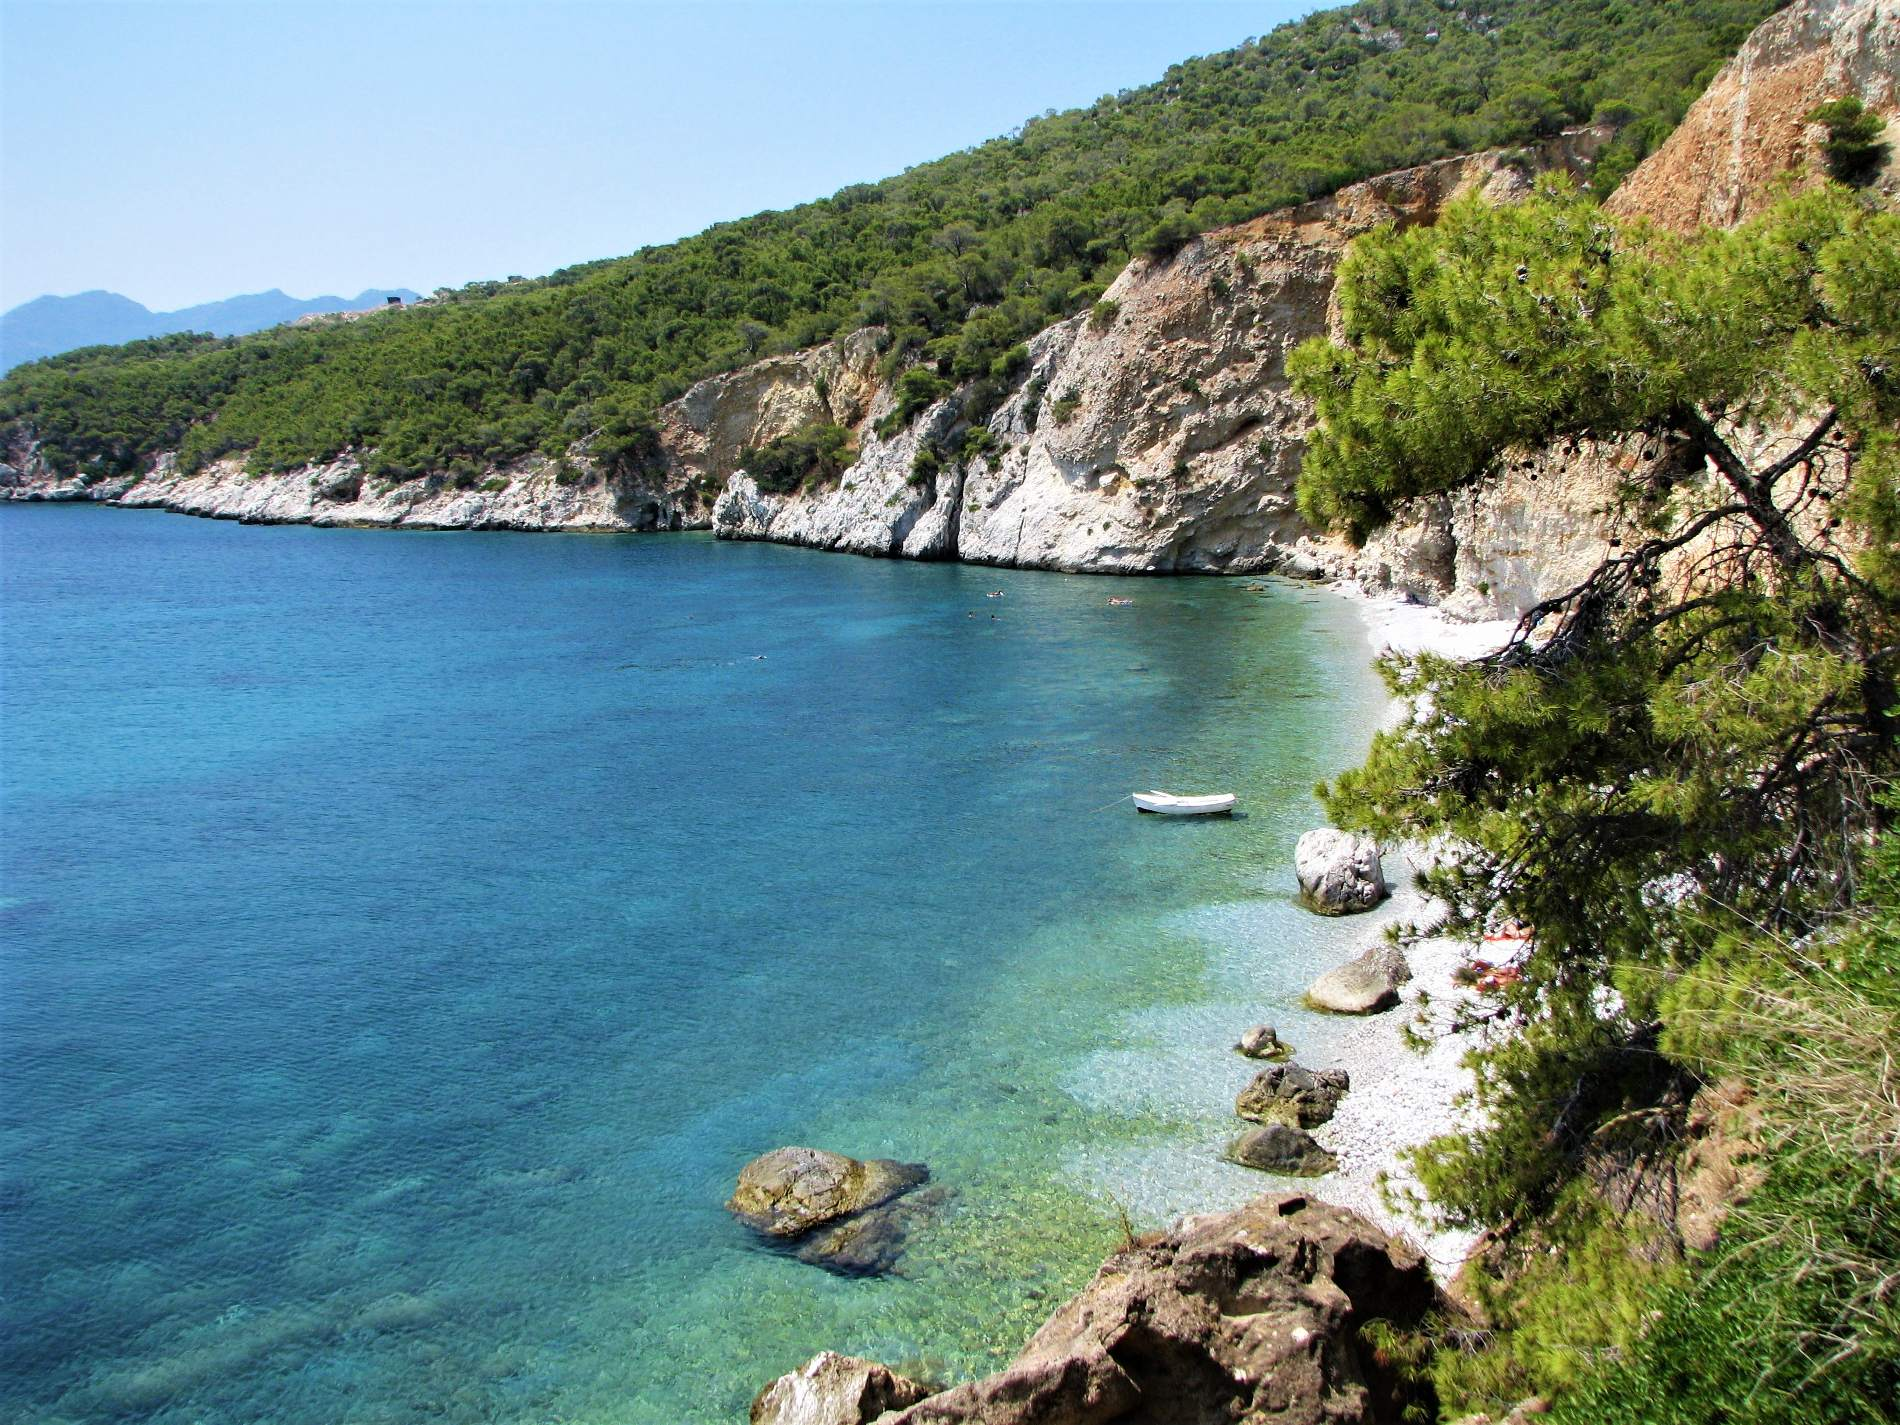 Chalikiada nudist beach in Agistri island. Source: Greece.com